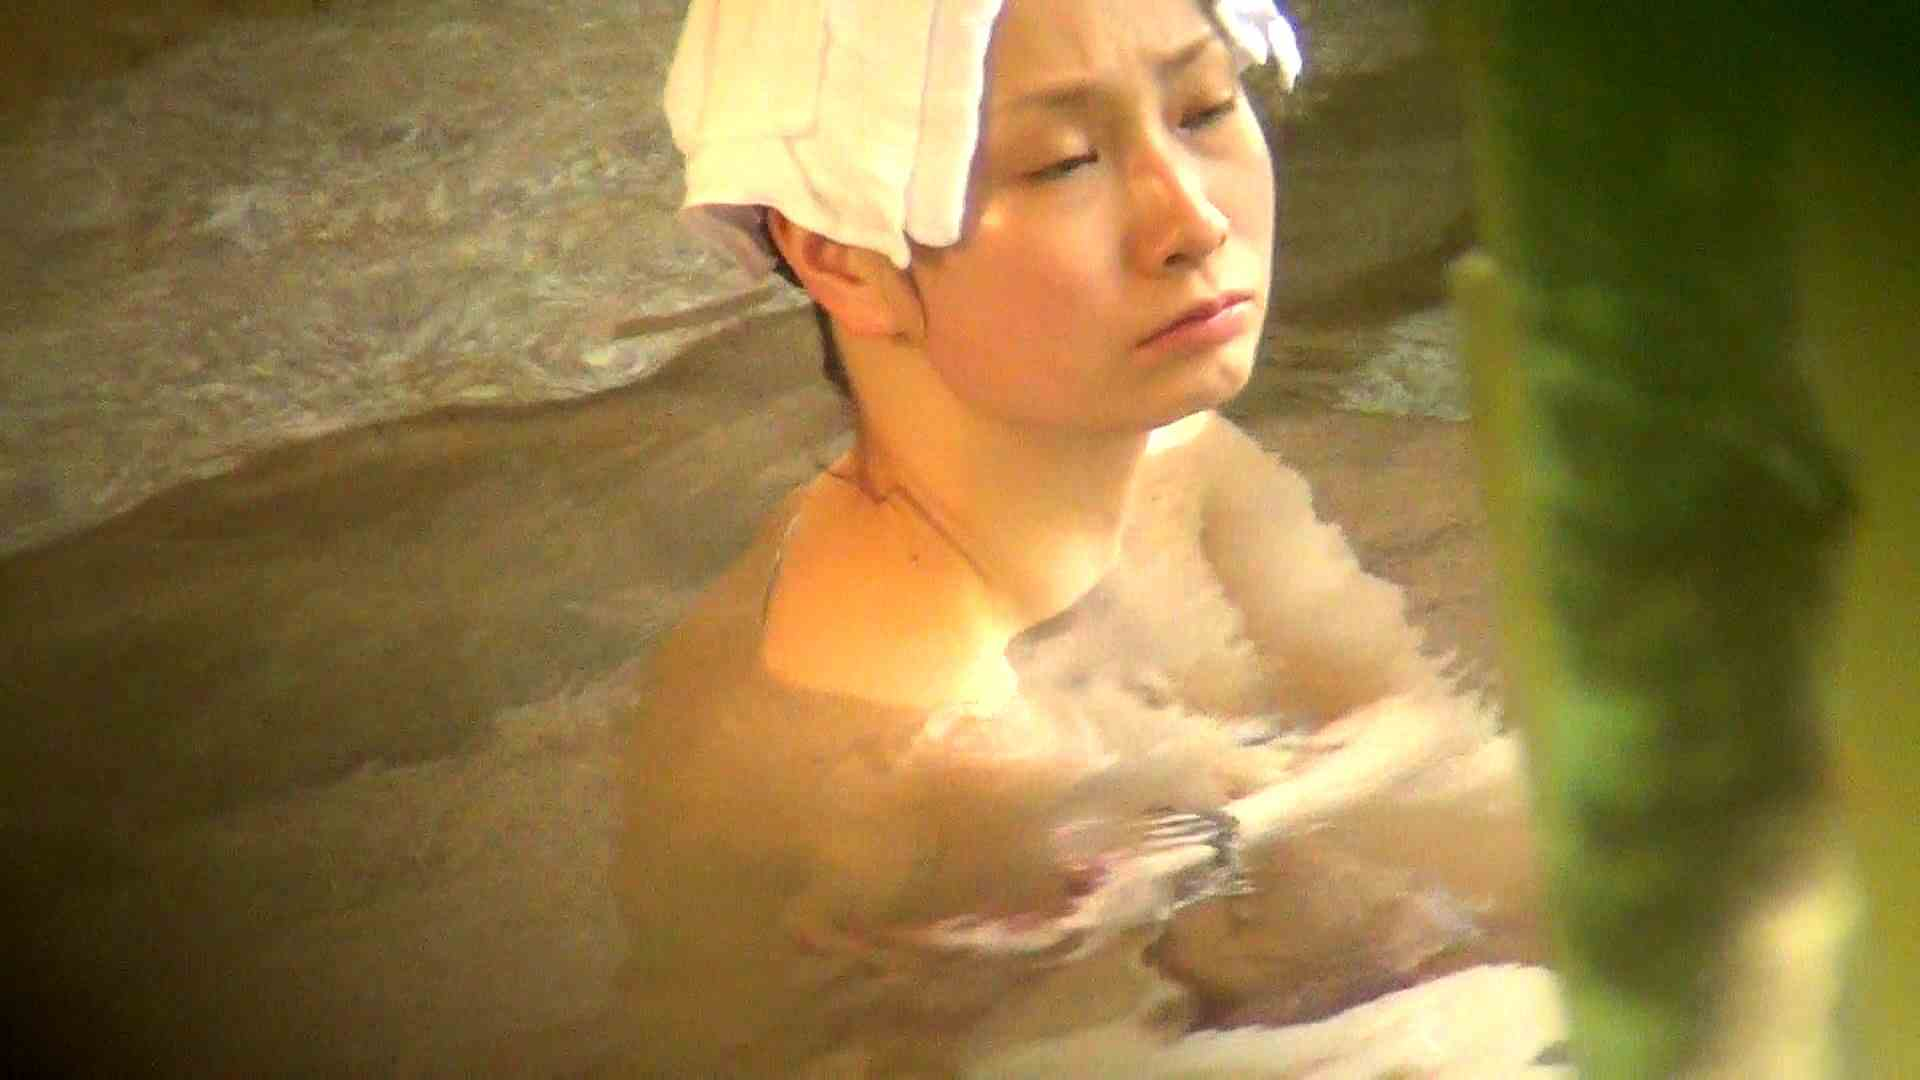 Aquaな露天風呂Vol.266 OLセックス | 露天  84画像 82